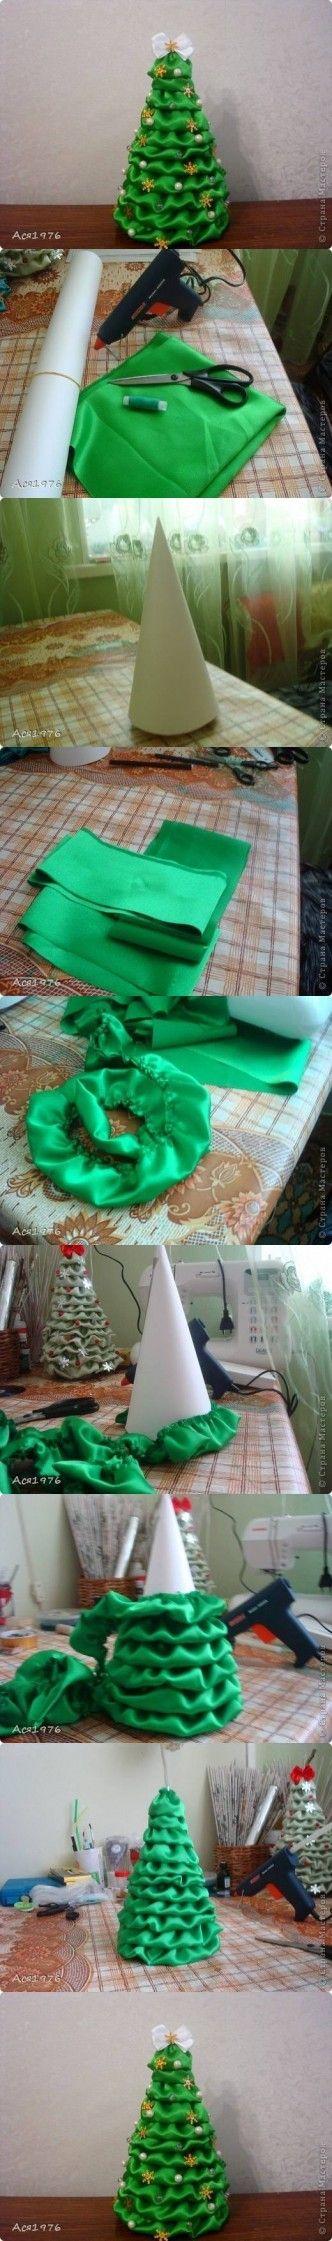 Fabric ruffle applied to styrofoam cone